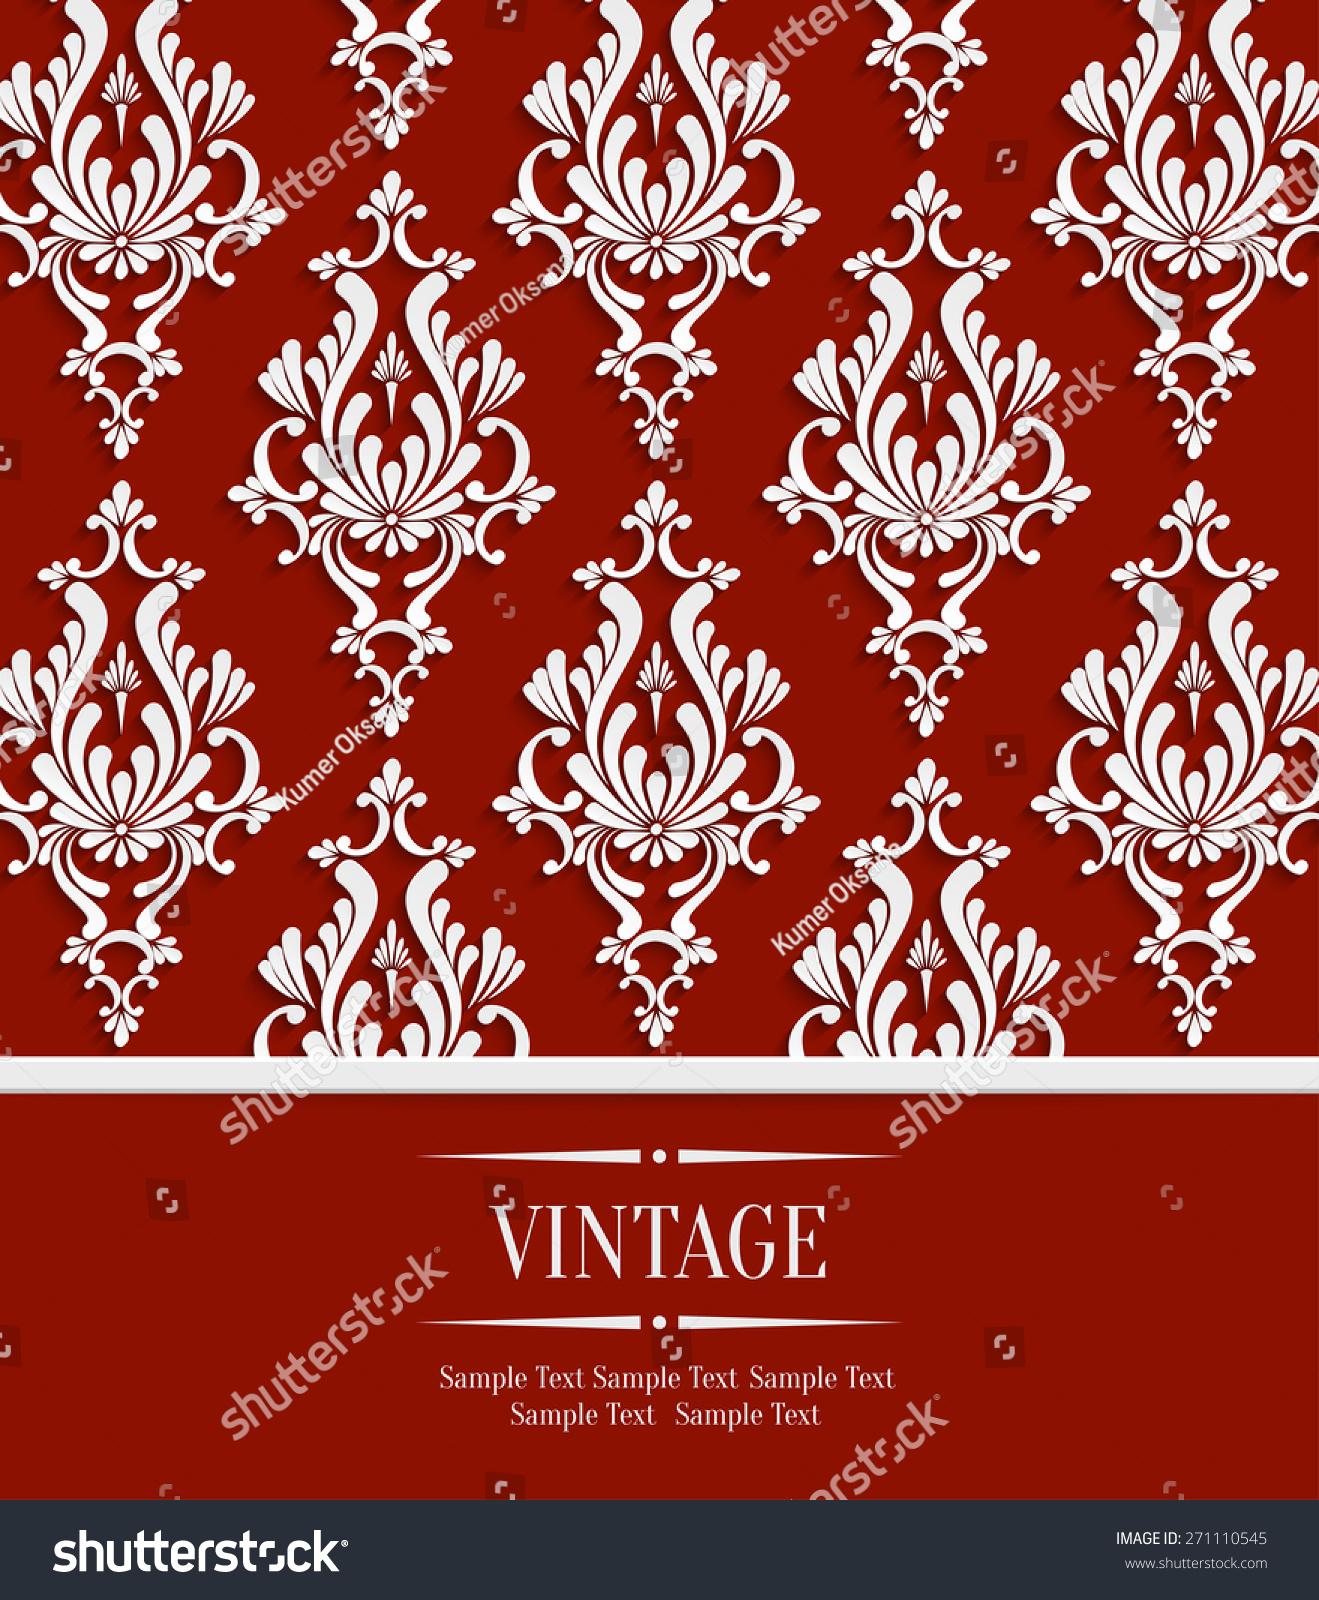 Vector Red Vintage Wedding Invitation Background Stock Vector ...